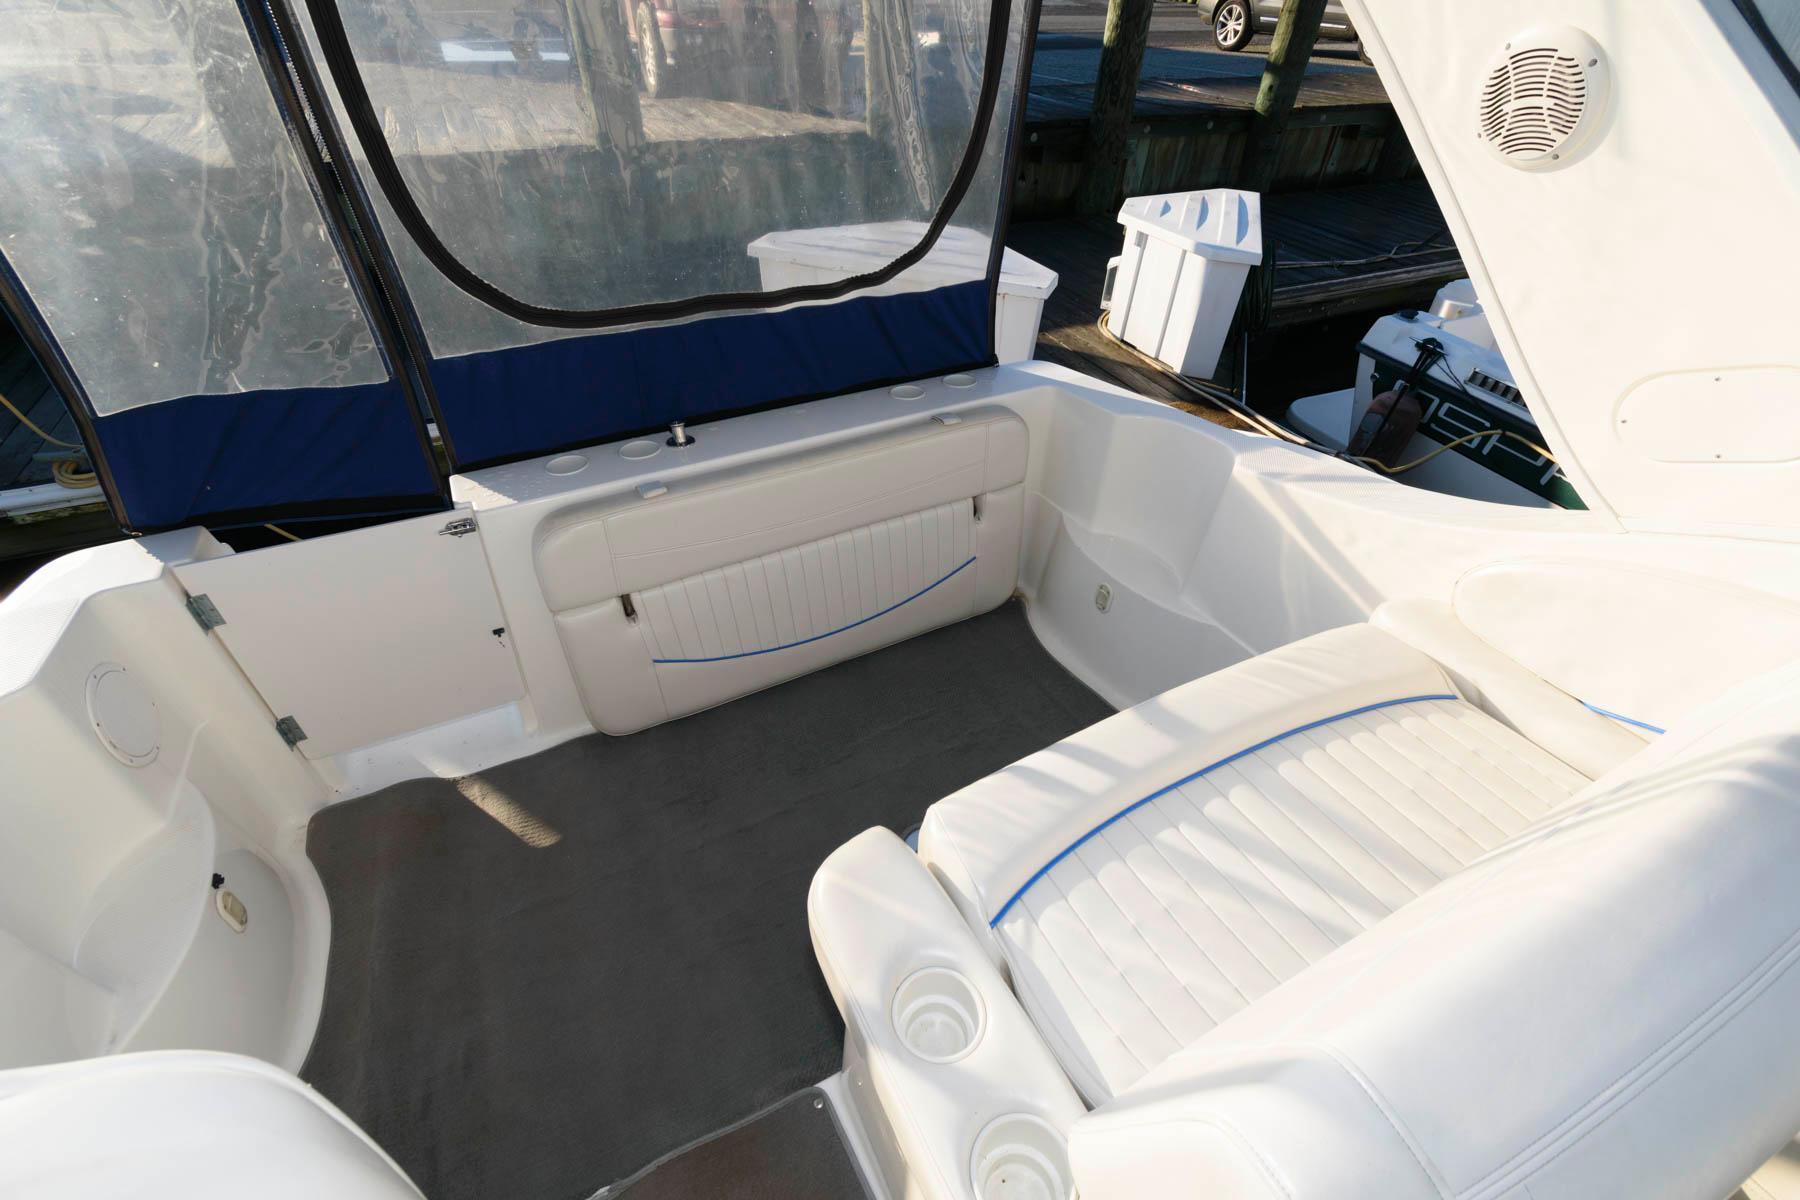 M 5756 VR Knot 10 Yacht Sales